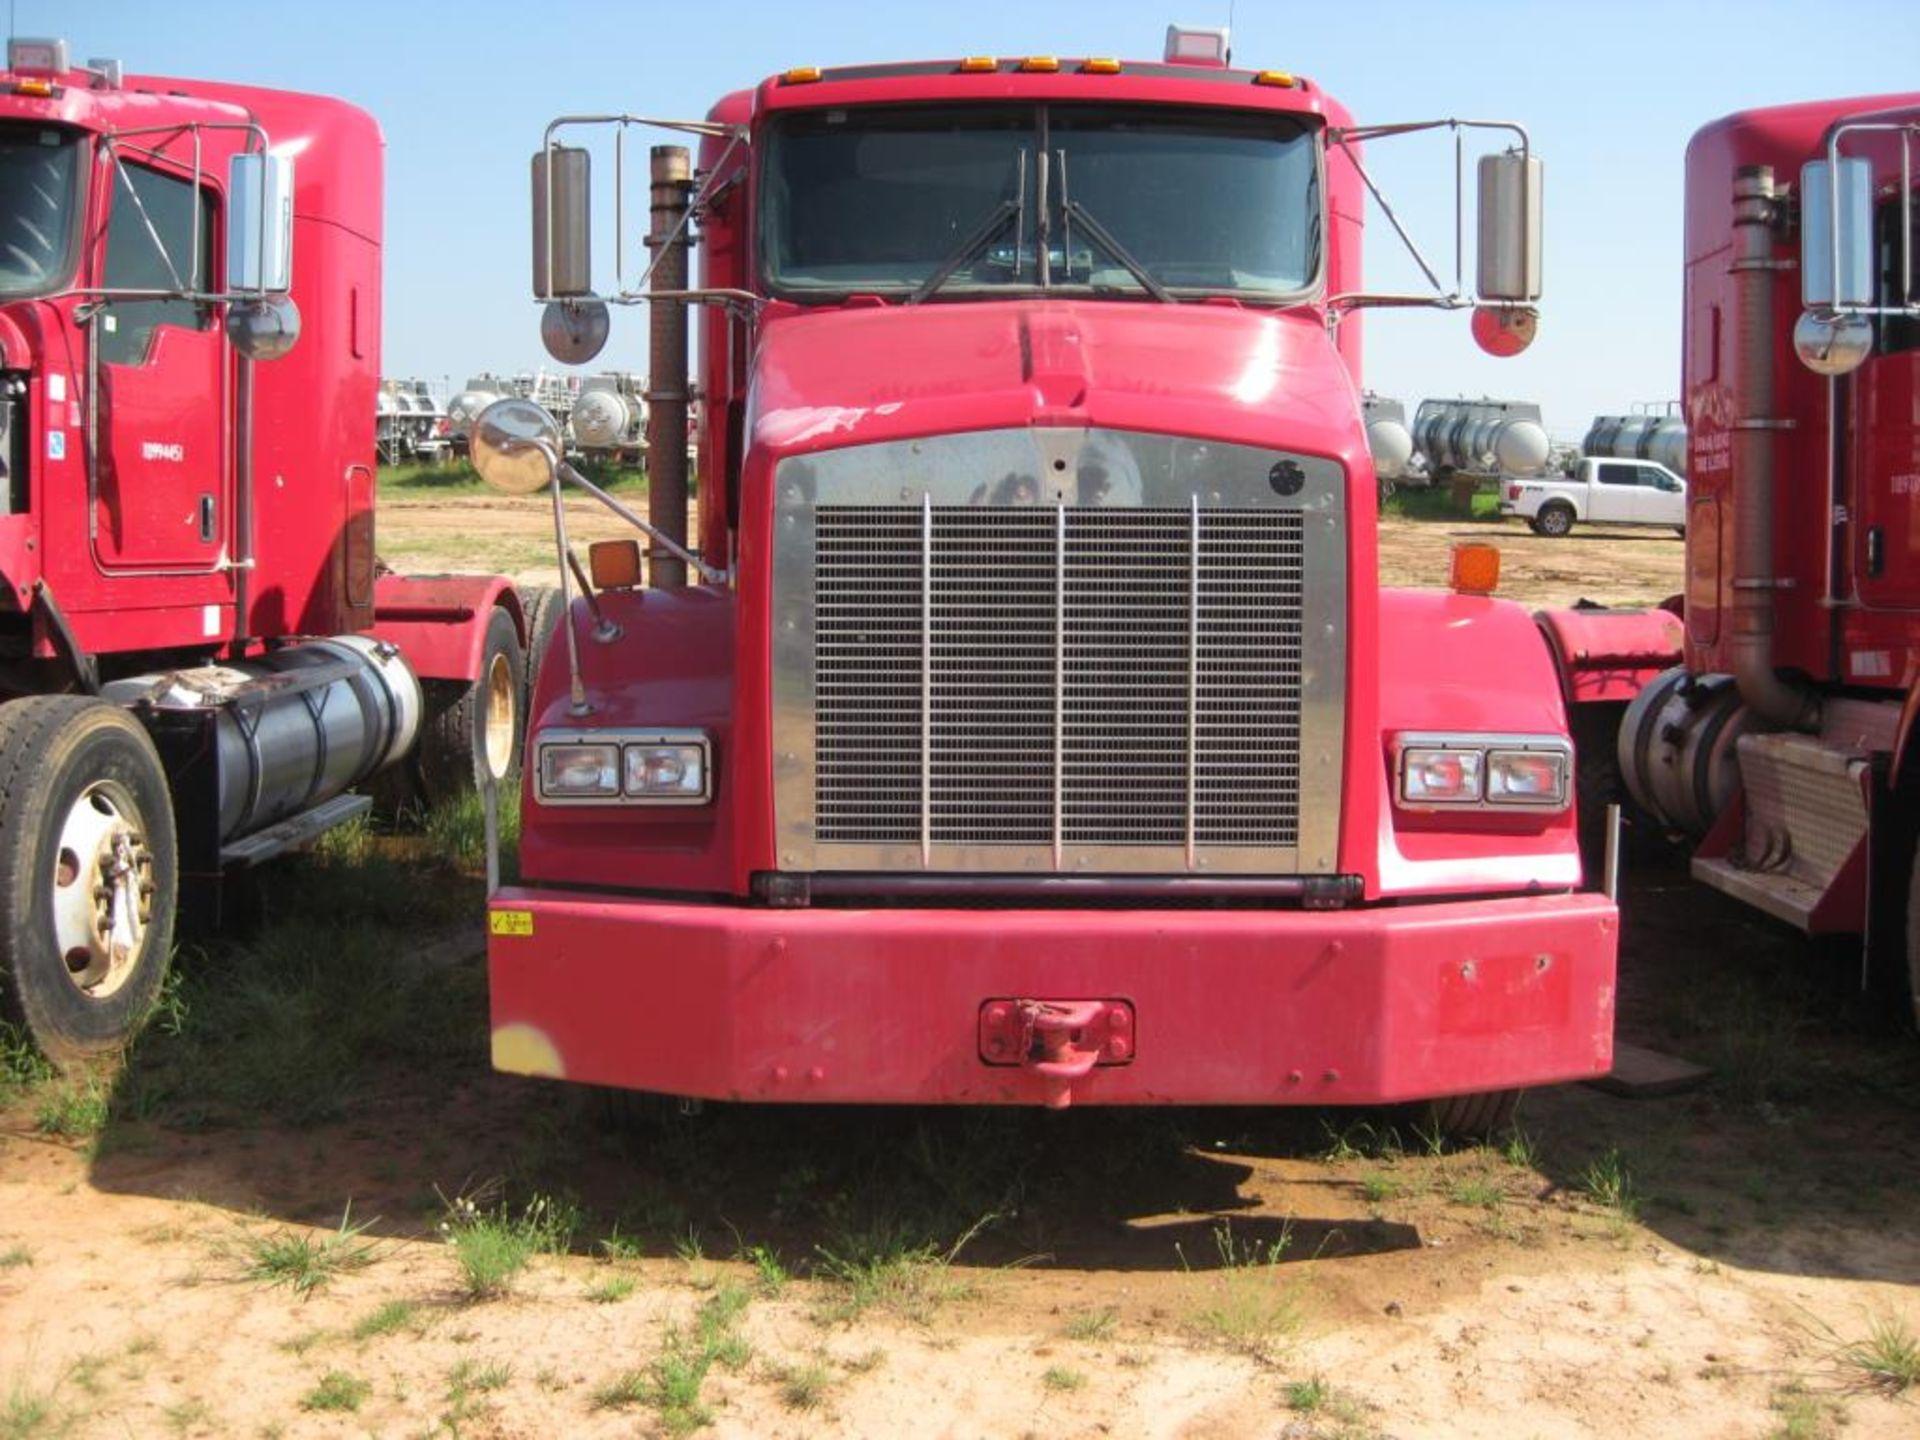 Kenworth Truck - Image 3 of 22